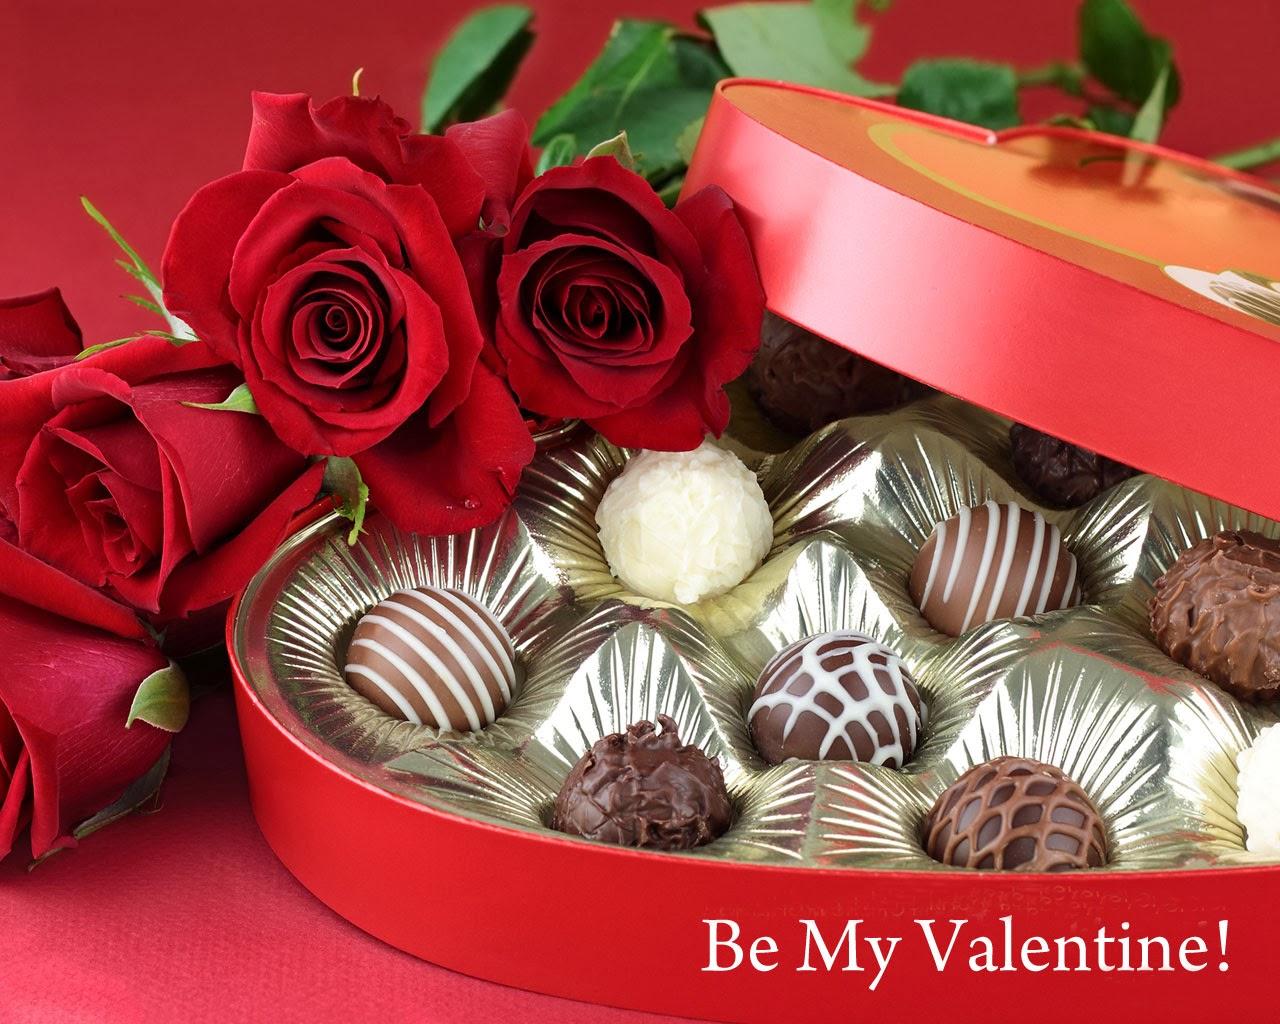 valentine-day-be-my-valentine